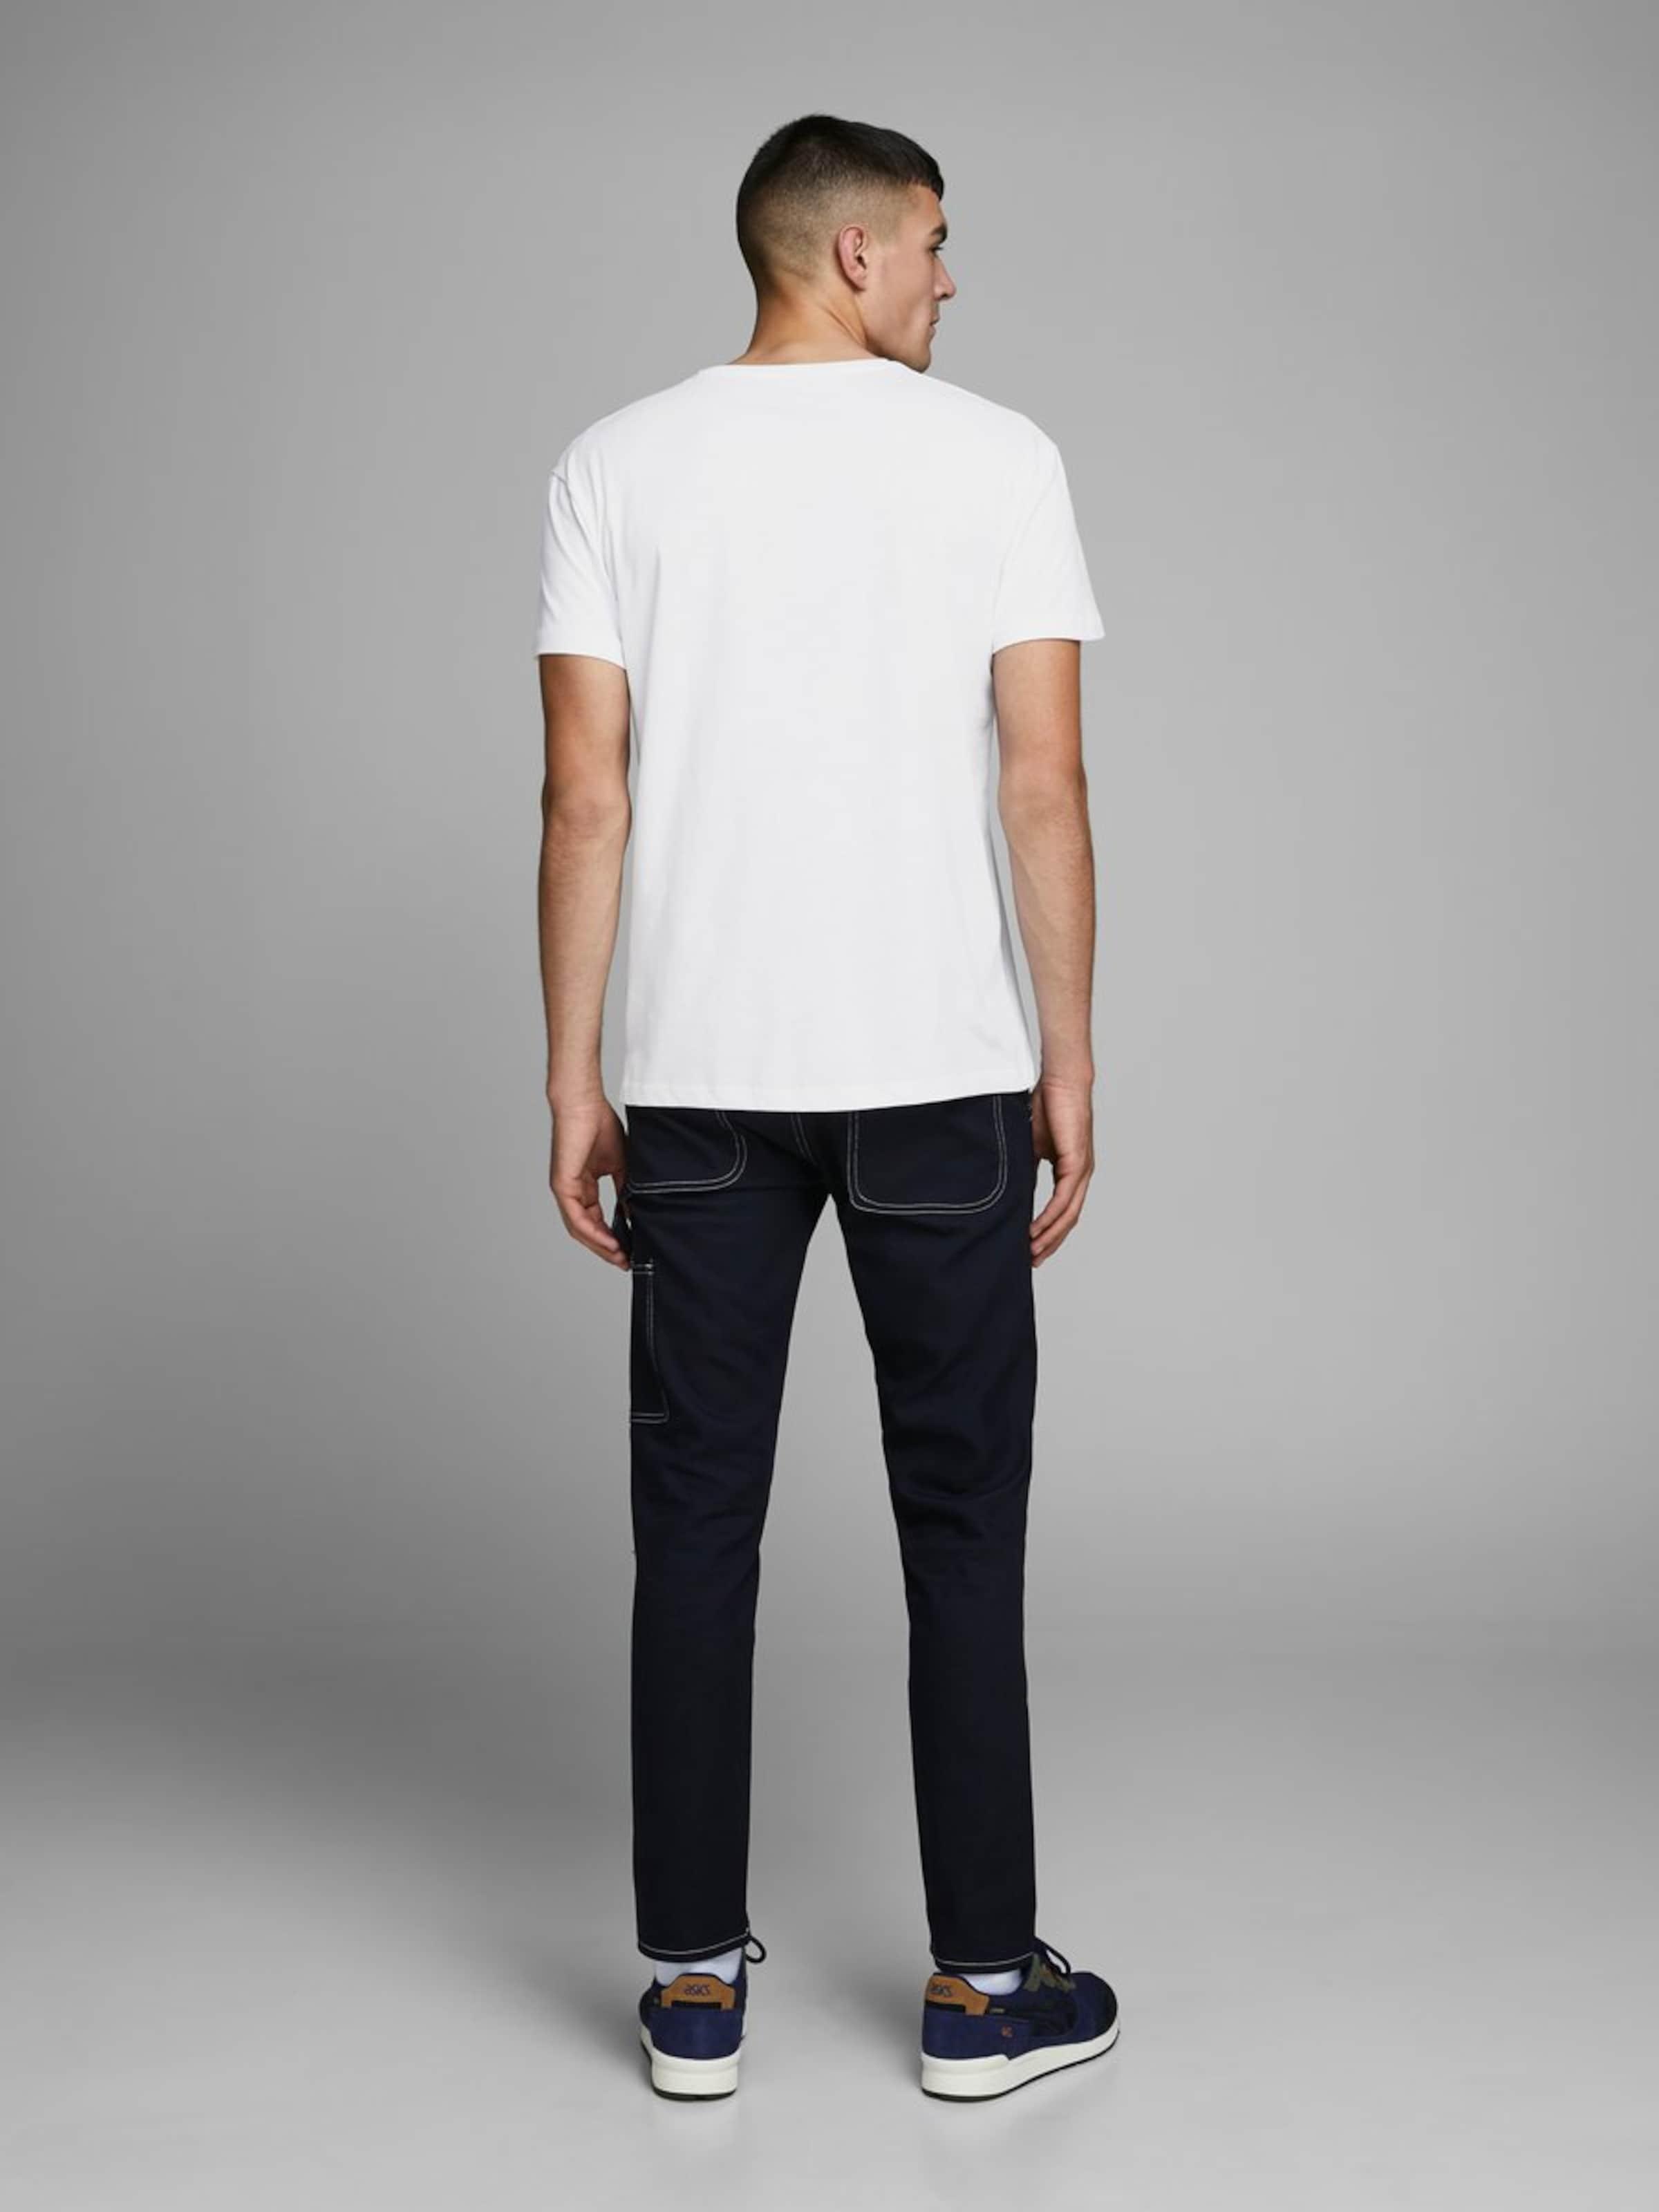 JACK JONES T-Shirt en blanc X5C7RR